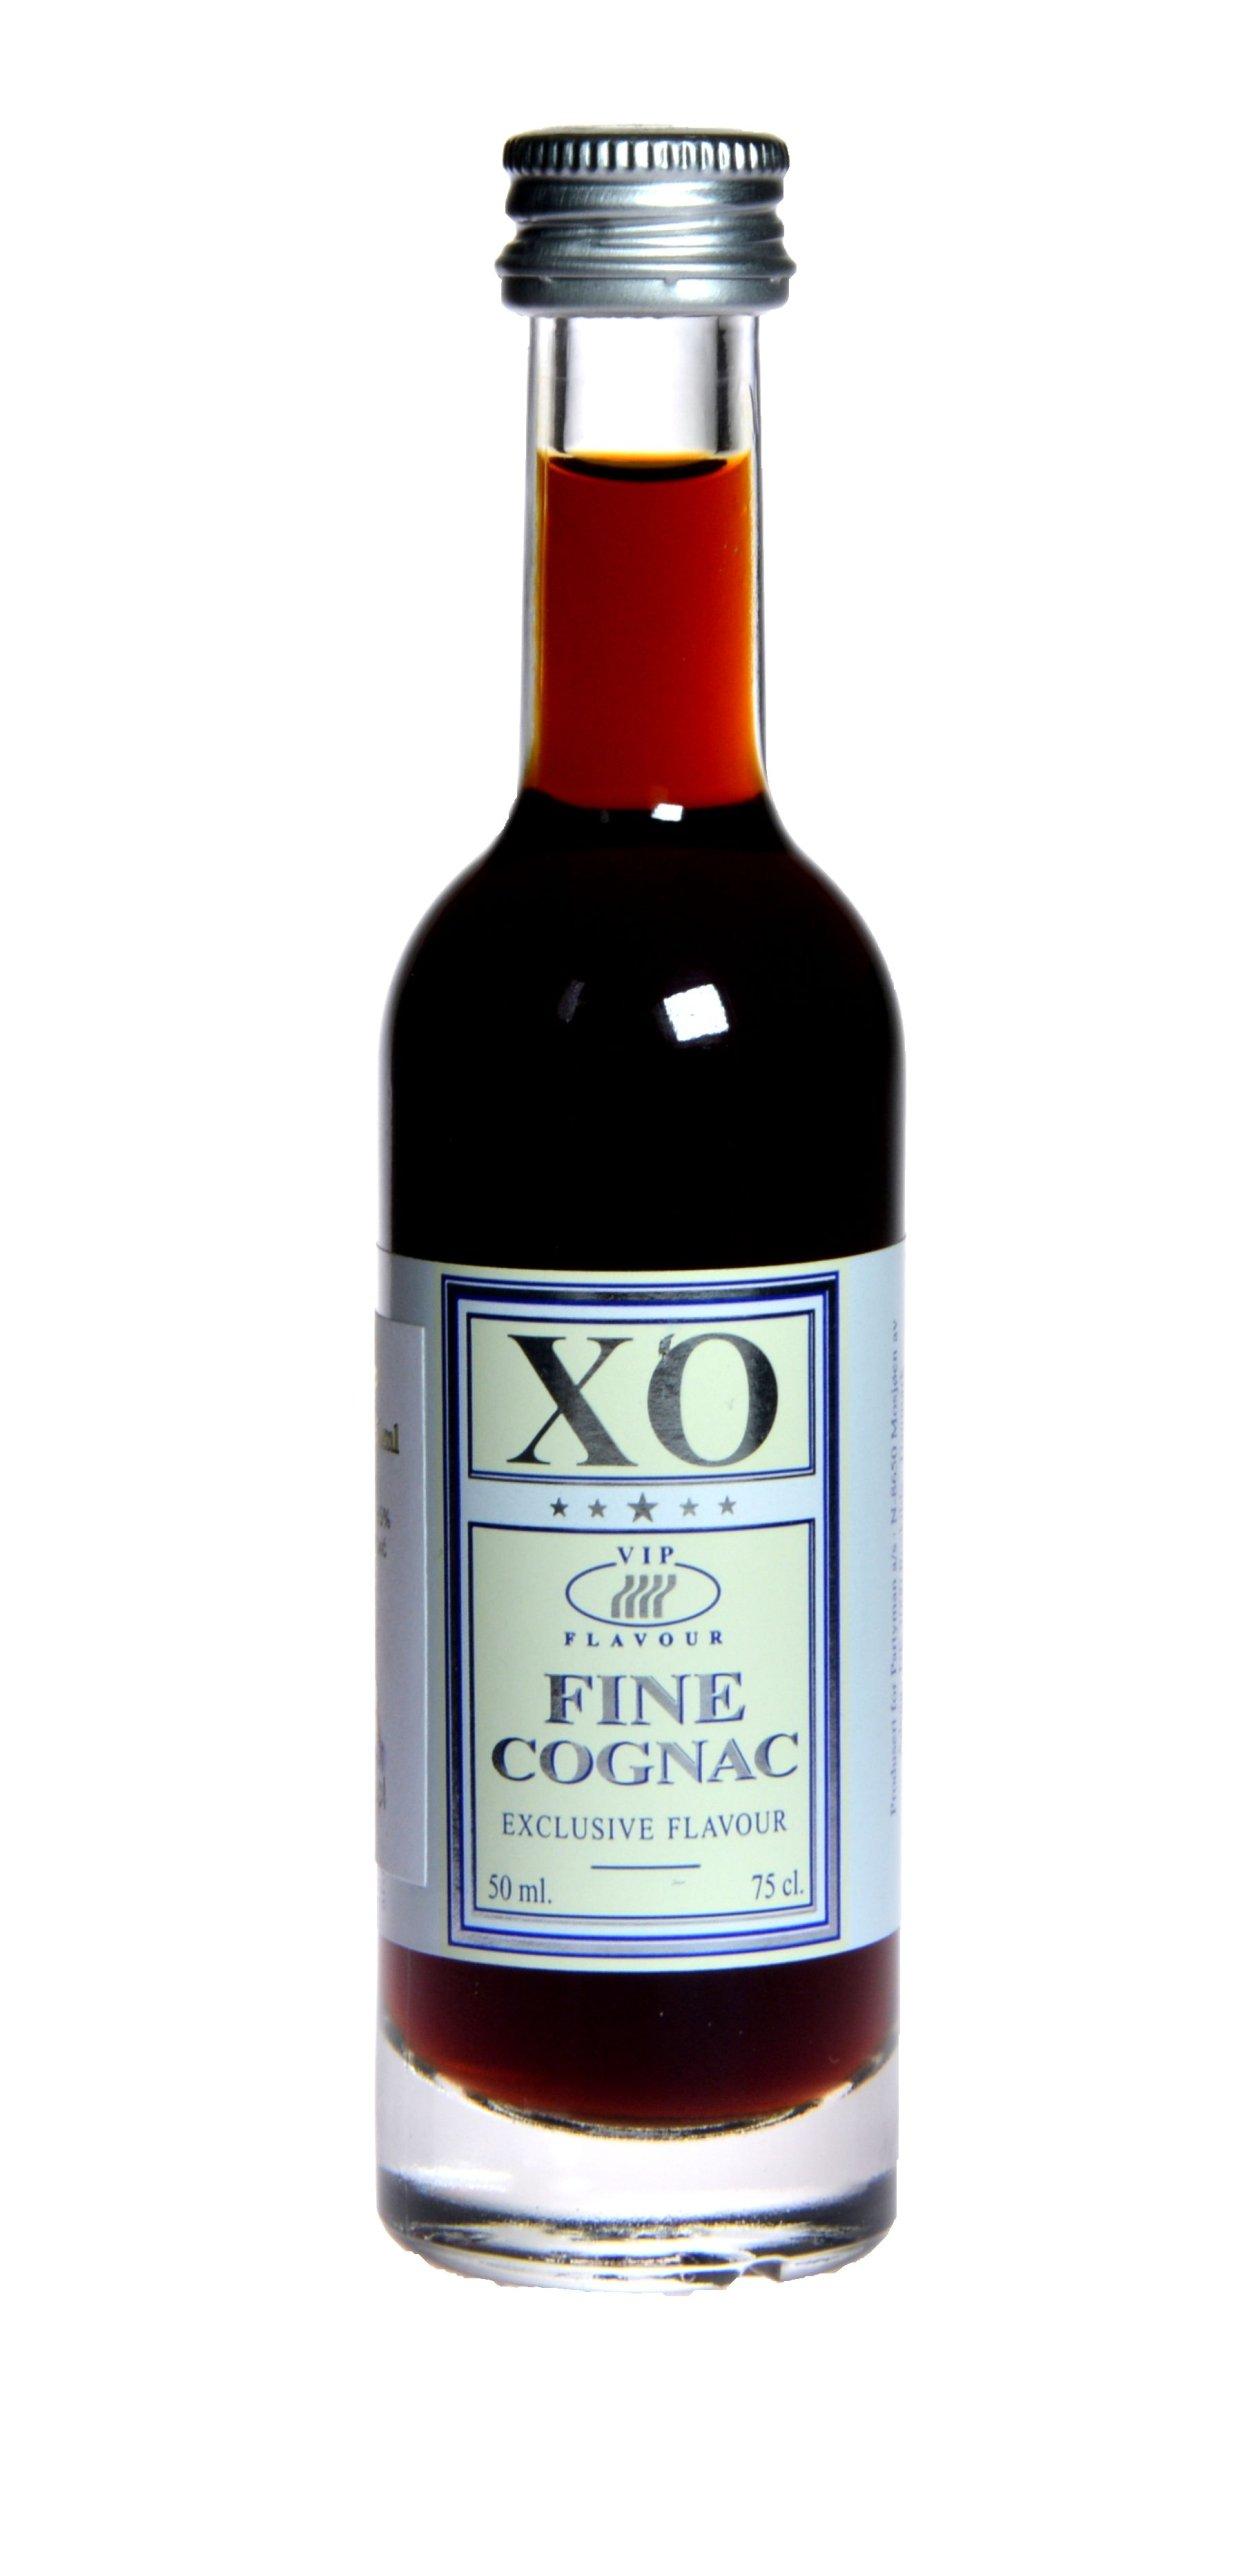 Zaprawka do alkoholu FINE COGNAC XO EXCLUSIVE 50ml